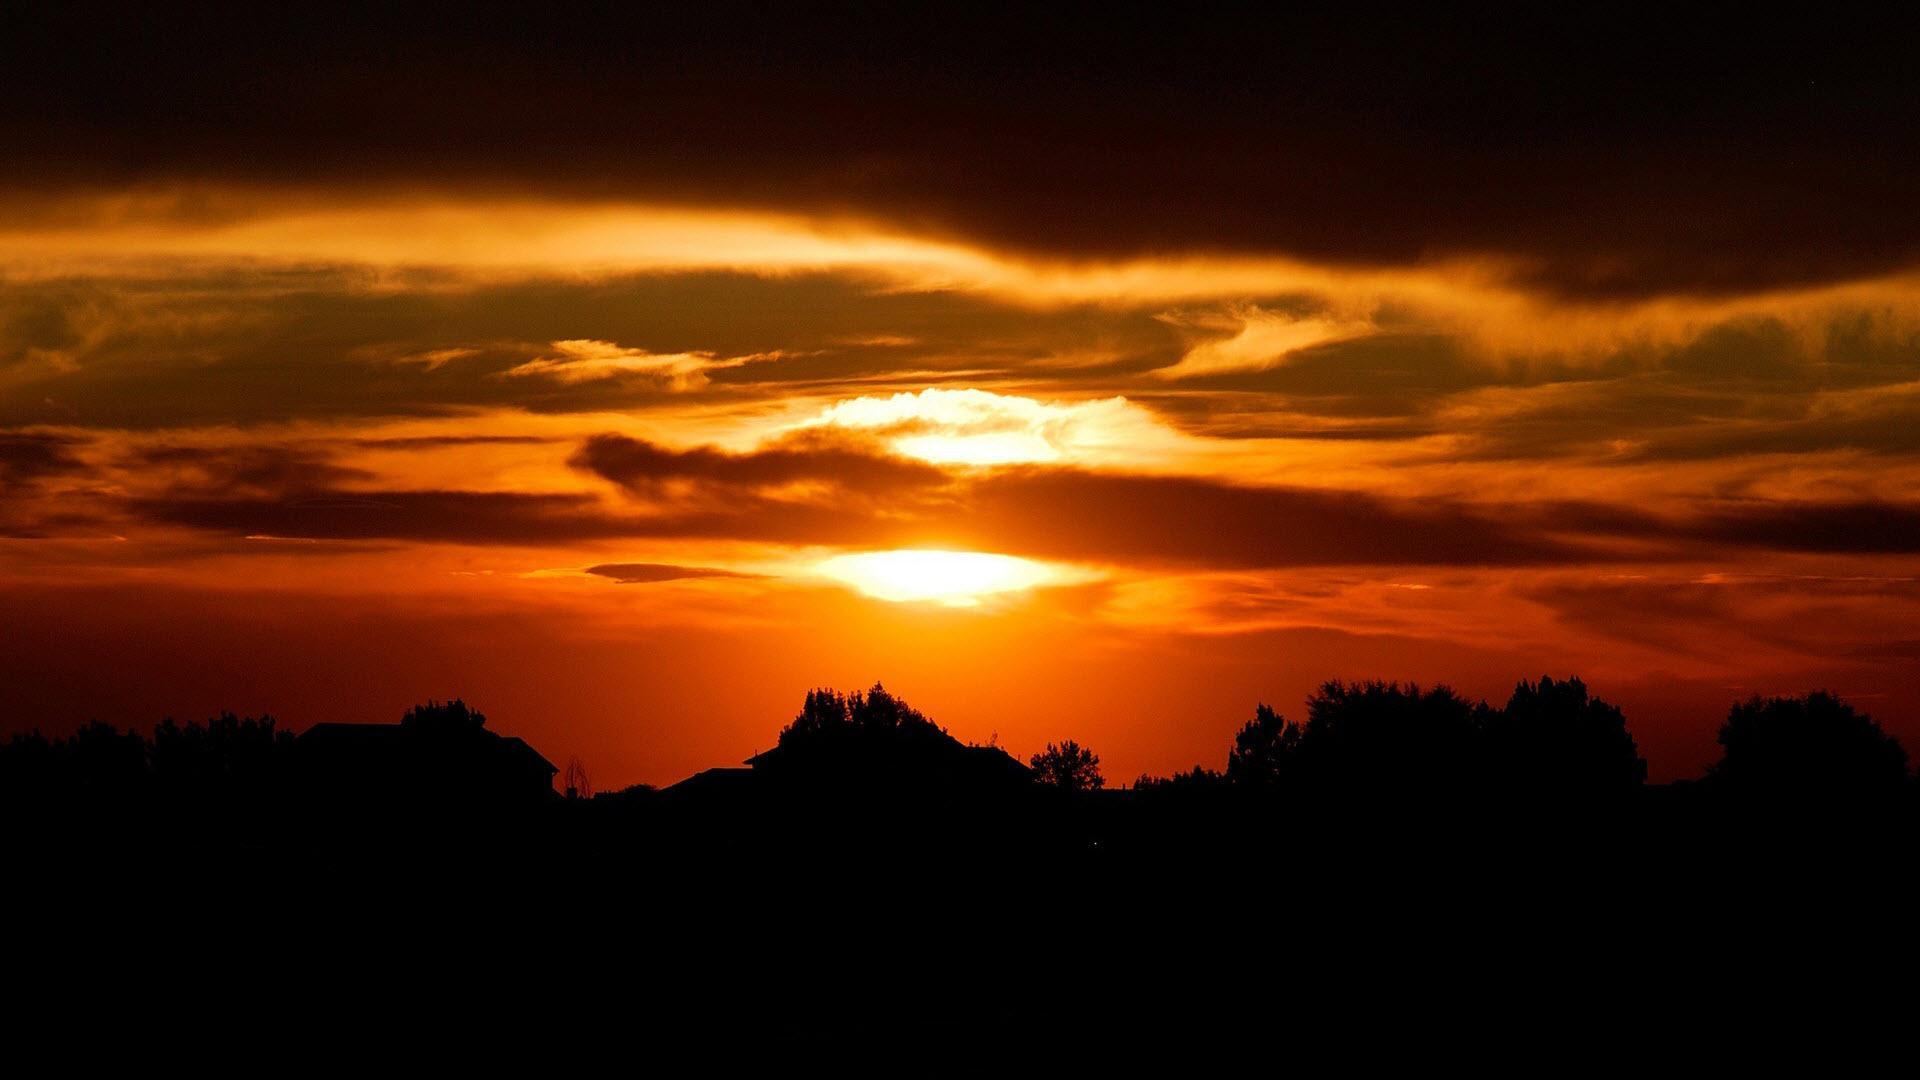 similar sunset desktop backgrounds hd wallpaper sunset desktop 1920x1080